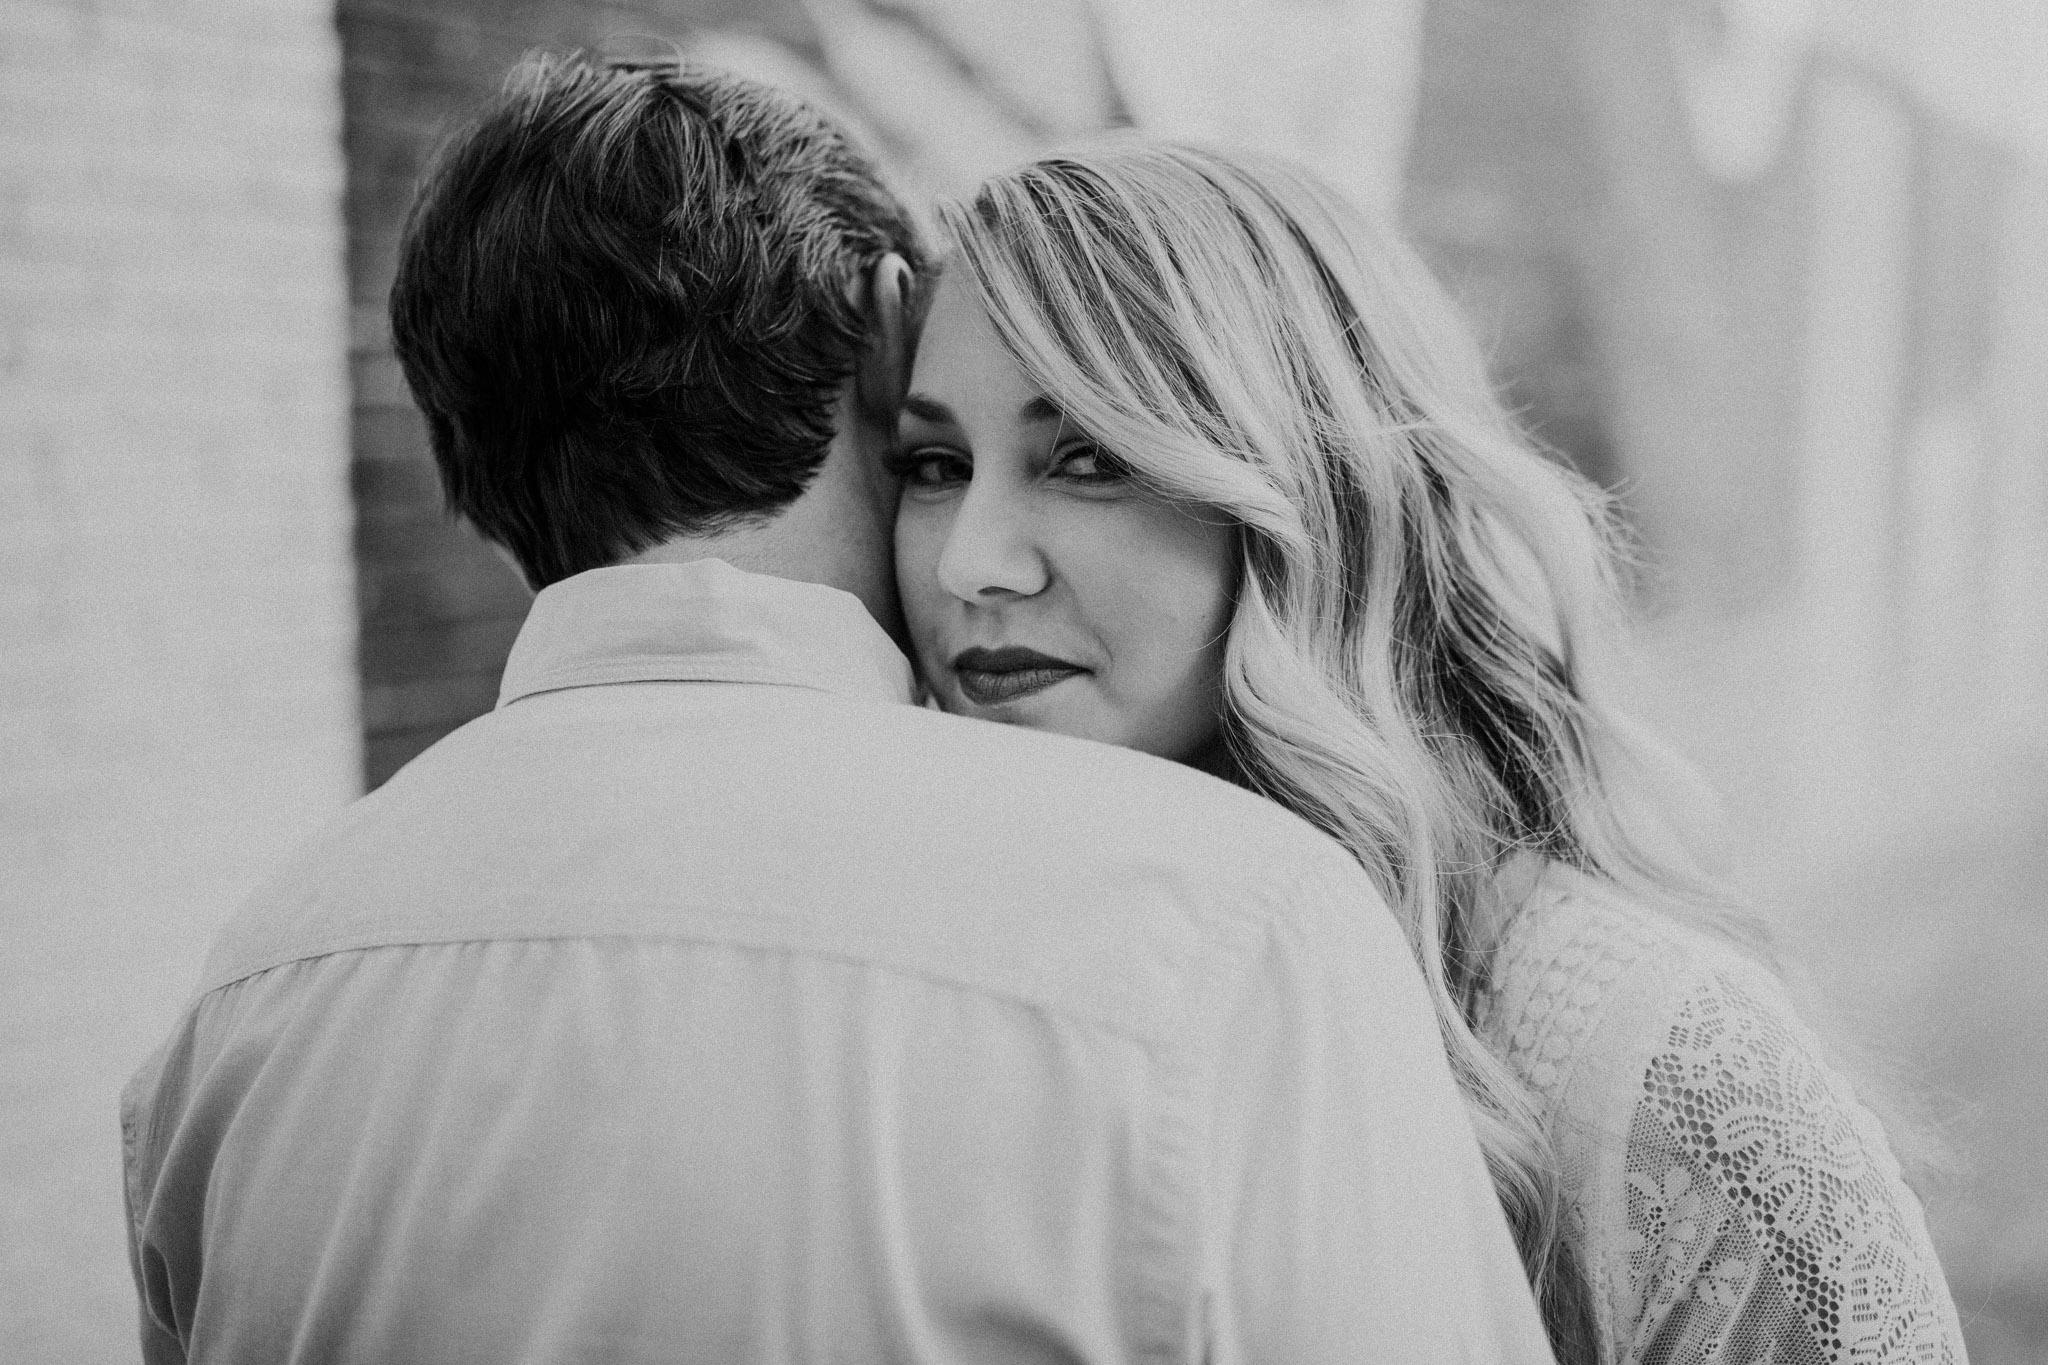 Angelle&Charlie_DFW_Wedding_Photography_02.jpg